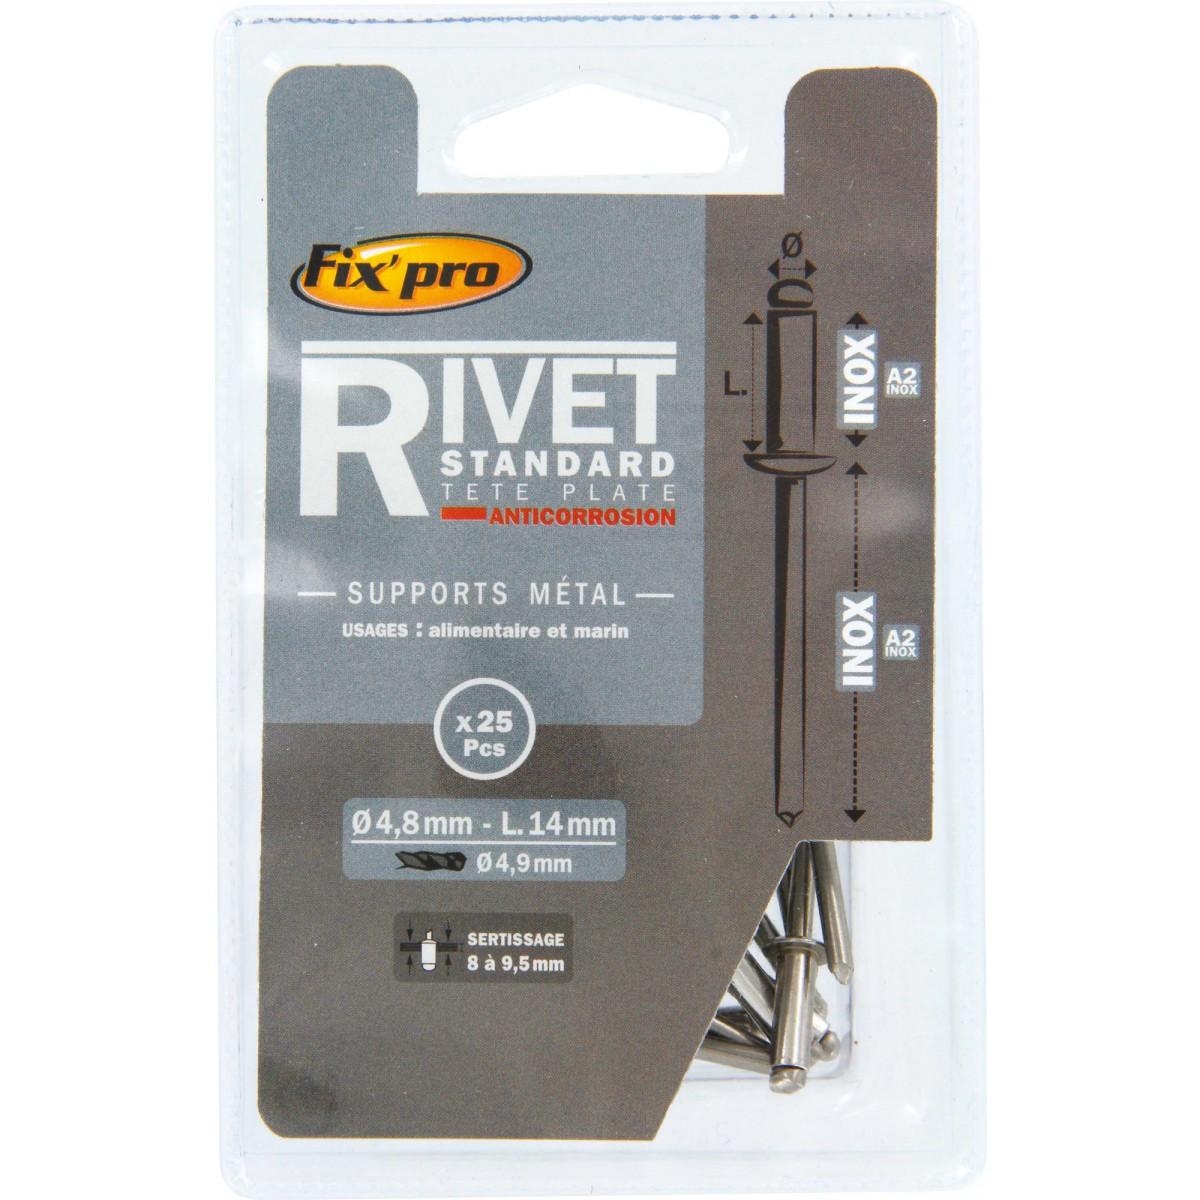 Rivet aveugle tête plate inox / inox A2 Fix'Pro - Longueur 14 mm - Diamètre 4,8 mm - Vendu par 25